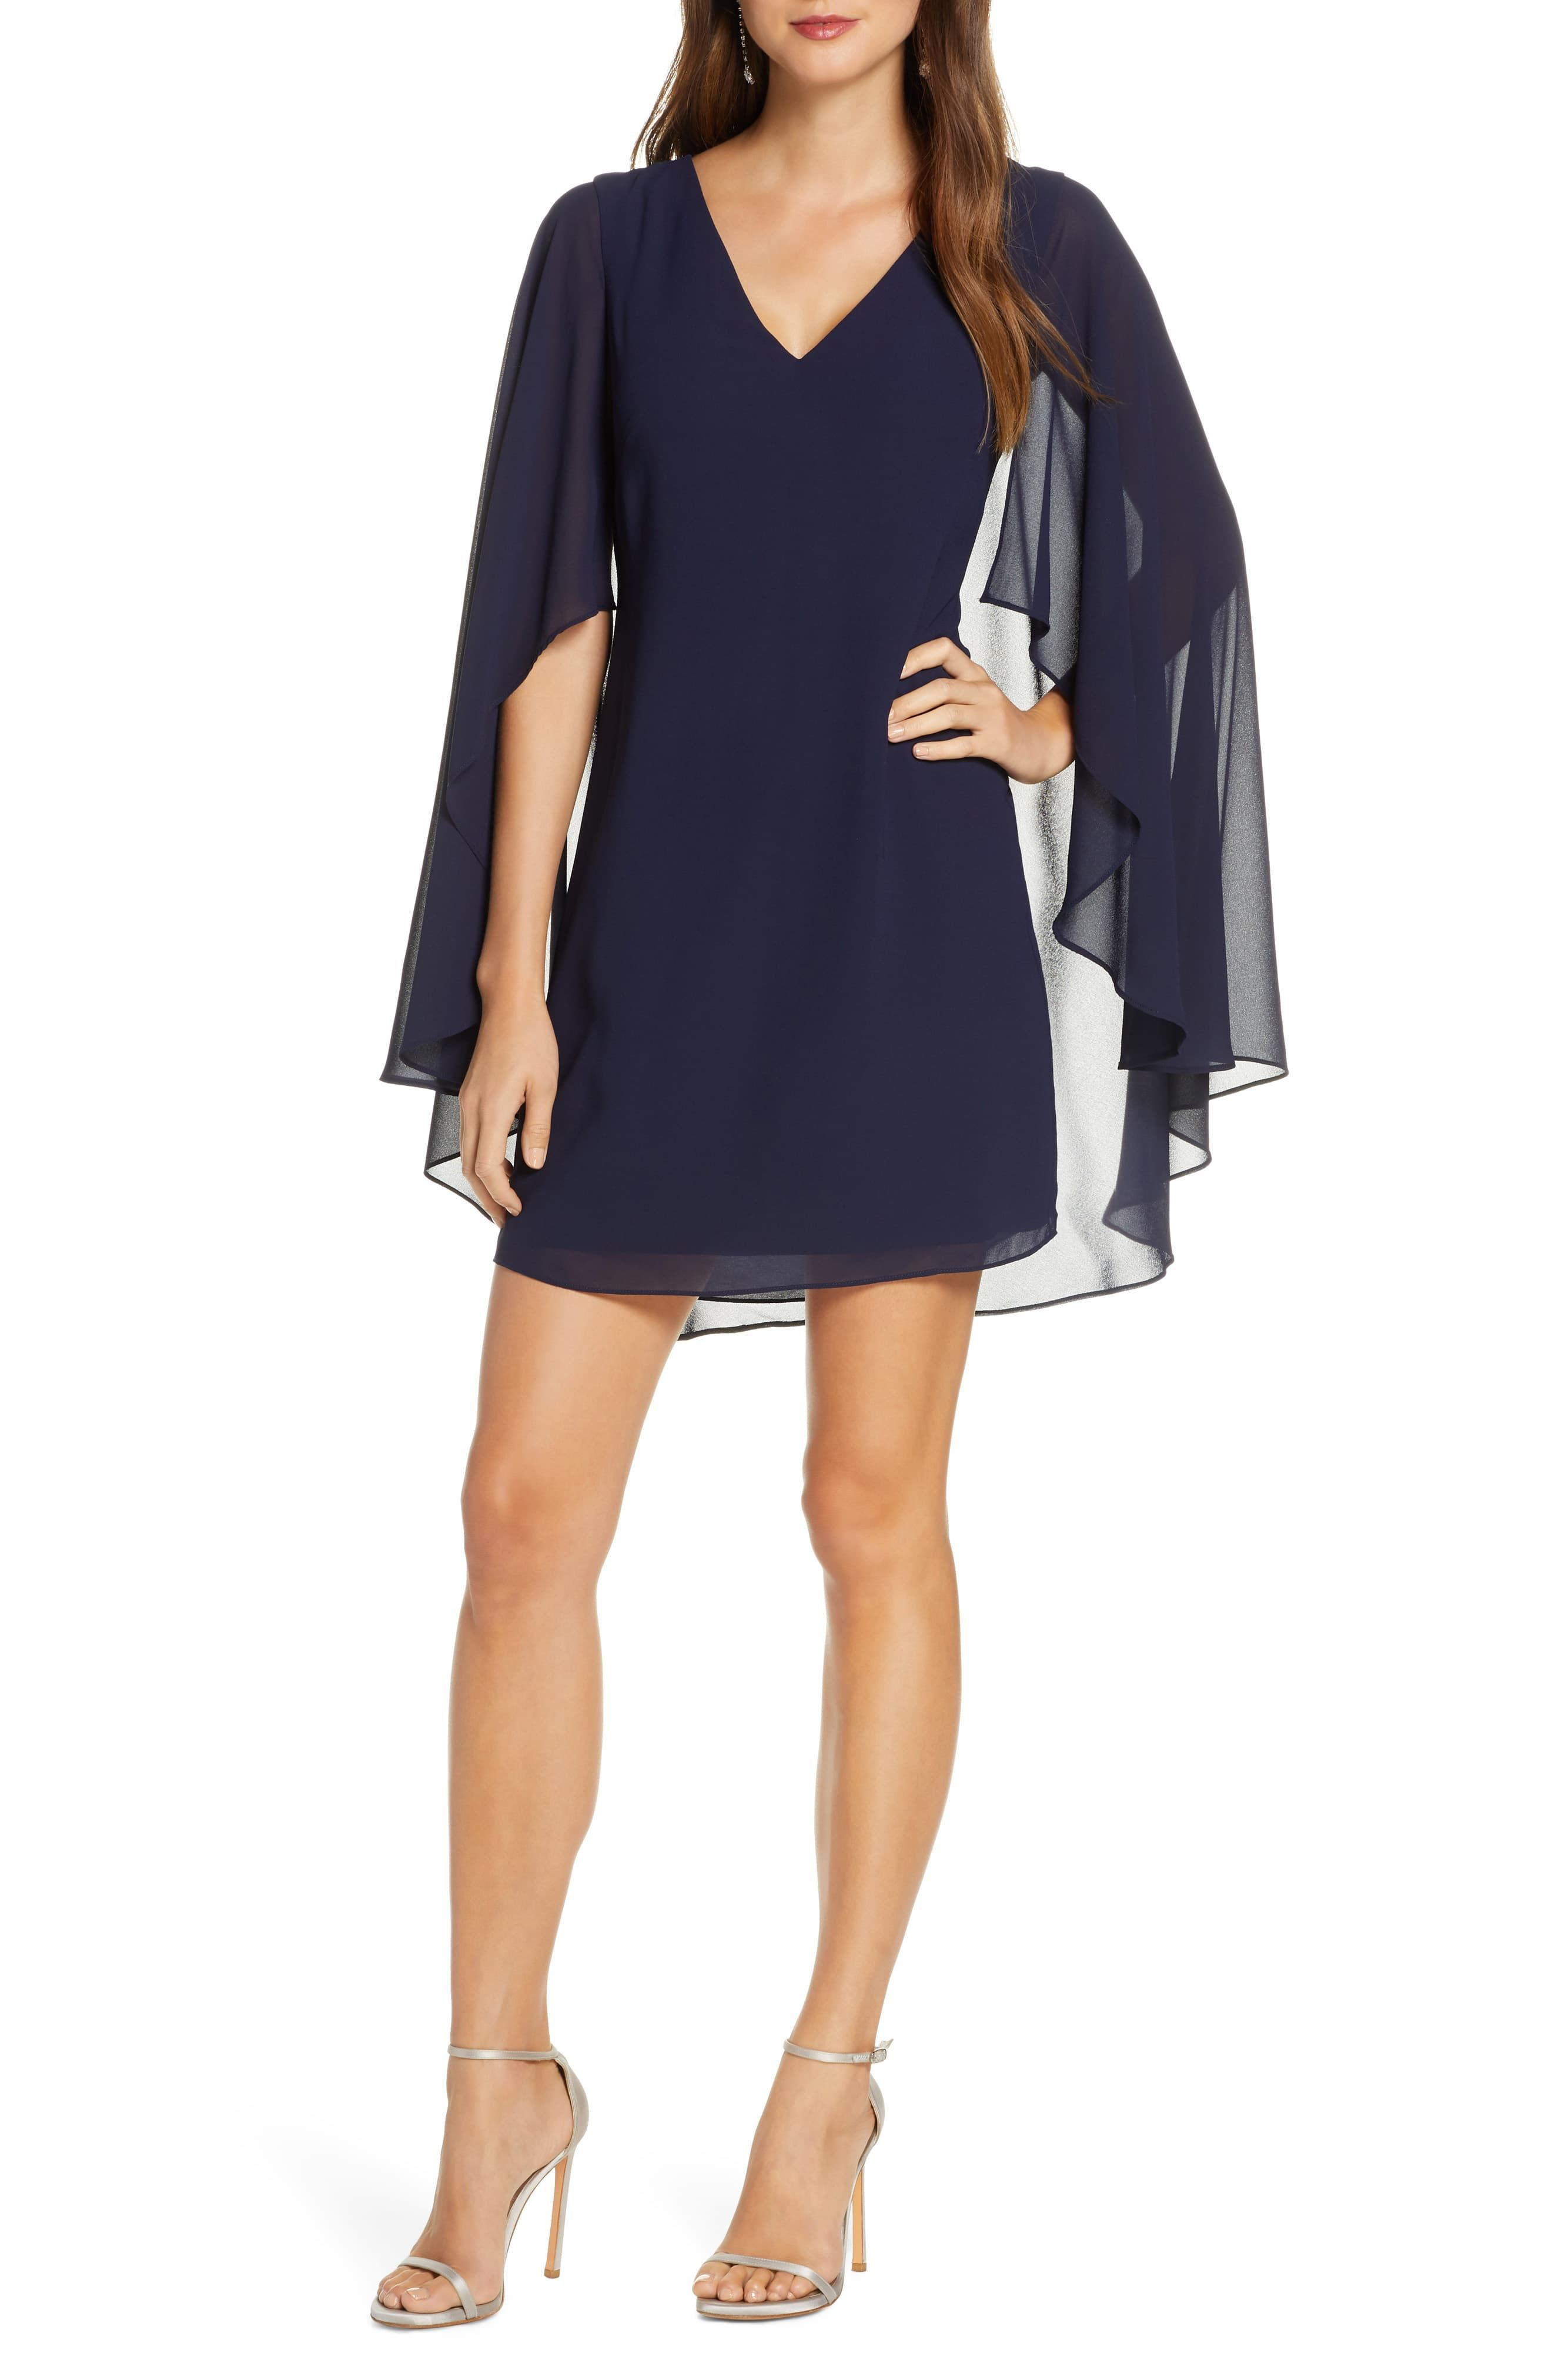 Vince Camuto Cape Back Shift Dress Regular Petite Nordstrom Fashion Clothes Women Dress Clothes For Women Fashion For Petite Women [ 4048 x 2640 Pixel ]